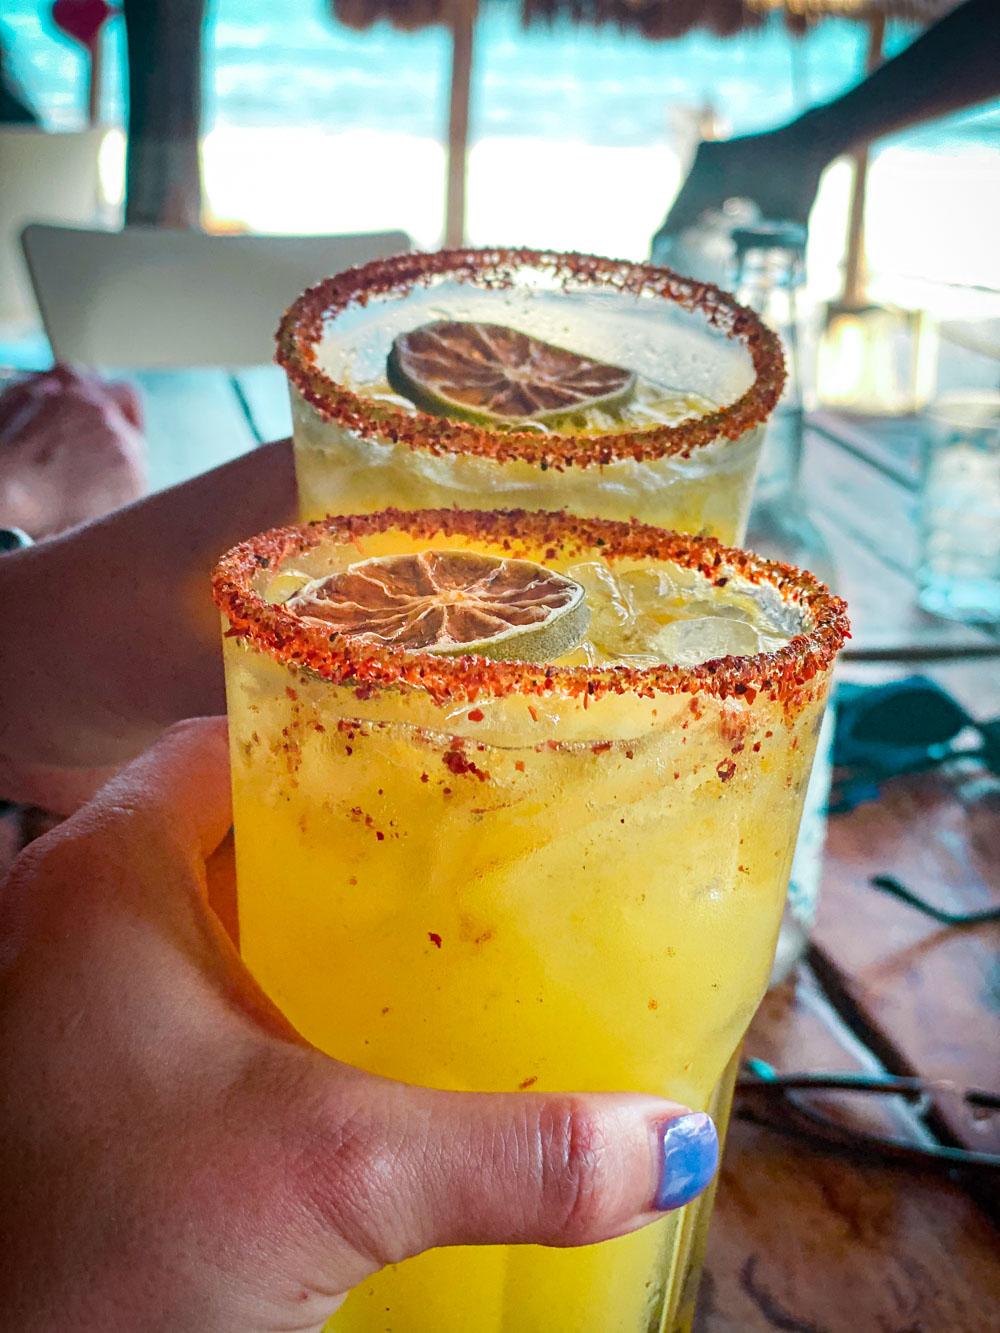 2 hands cheersing passionfruit margaritas at Lido Beach Club in the Yucatan.